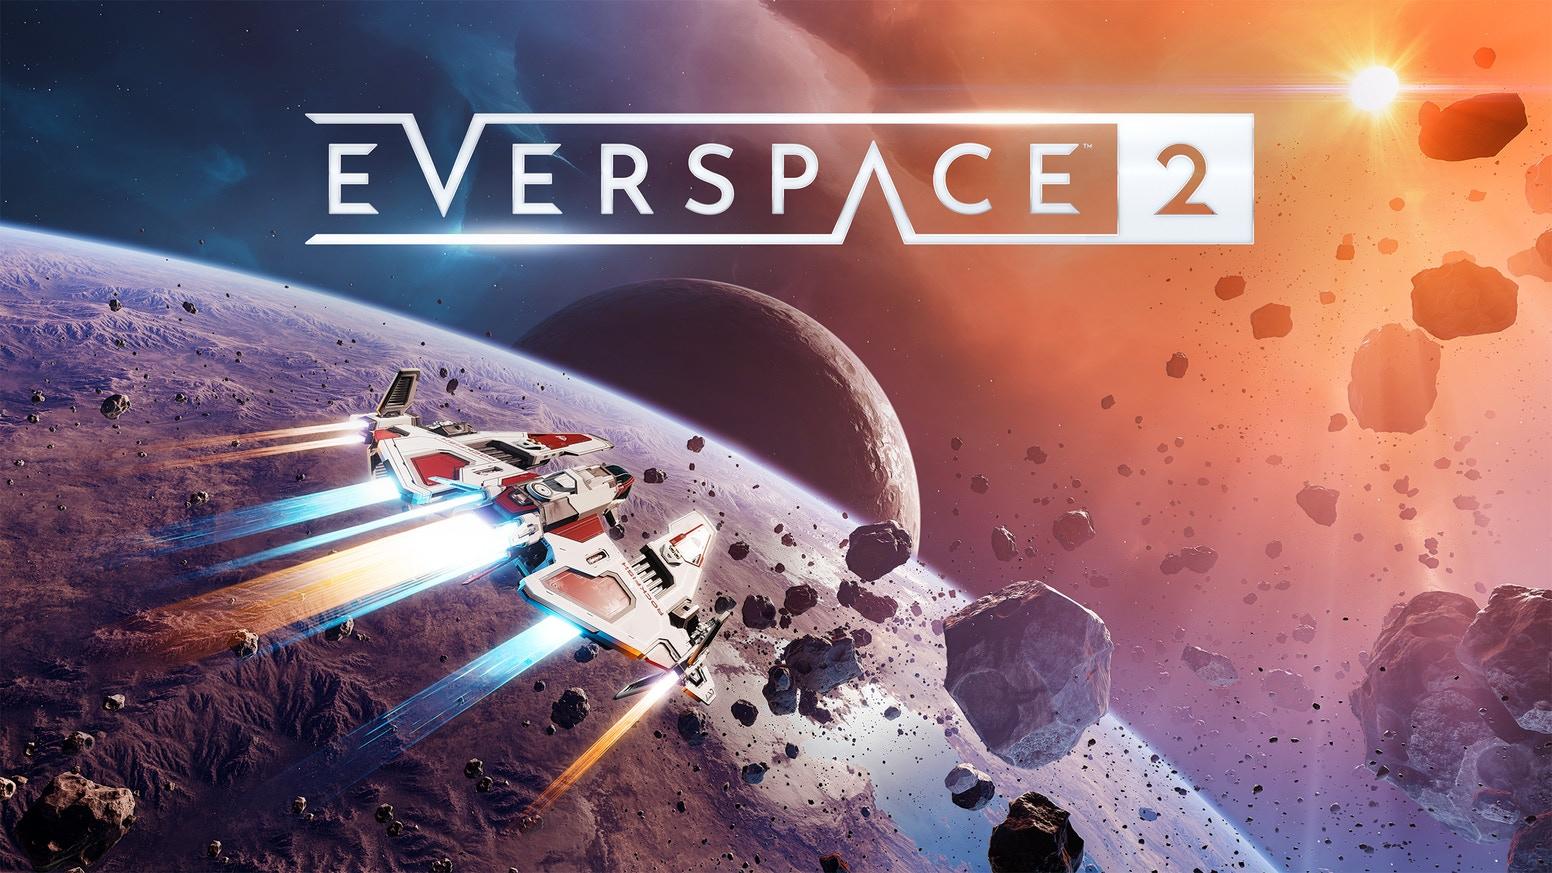 Кредиты на сборку космолёта: Everspace 2 собрала средства на разработку